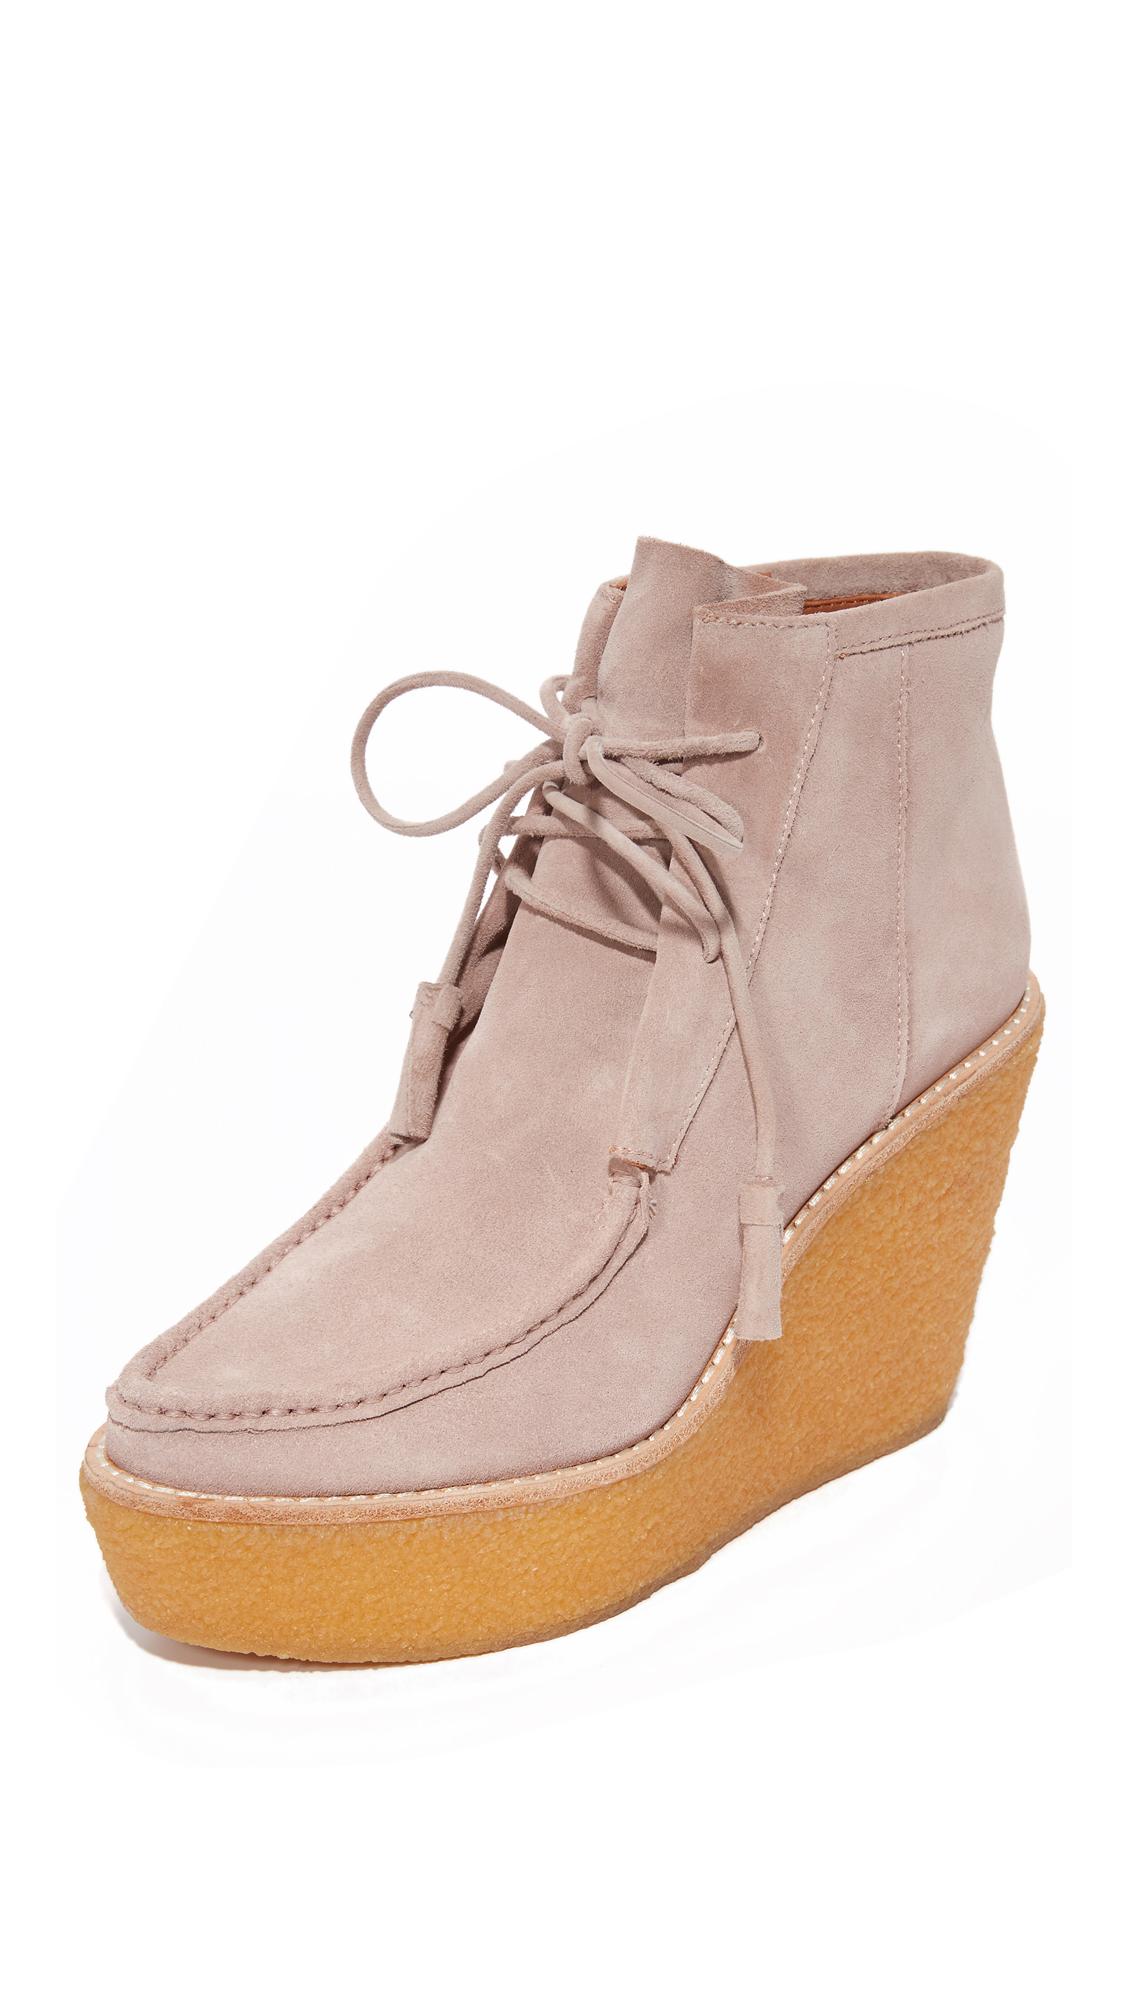 Derek Lam 10 Crosby Sorelle Platform Booties - Lilac at Shopbop